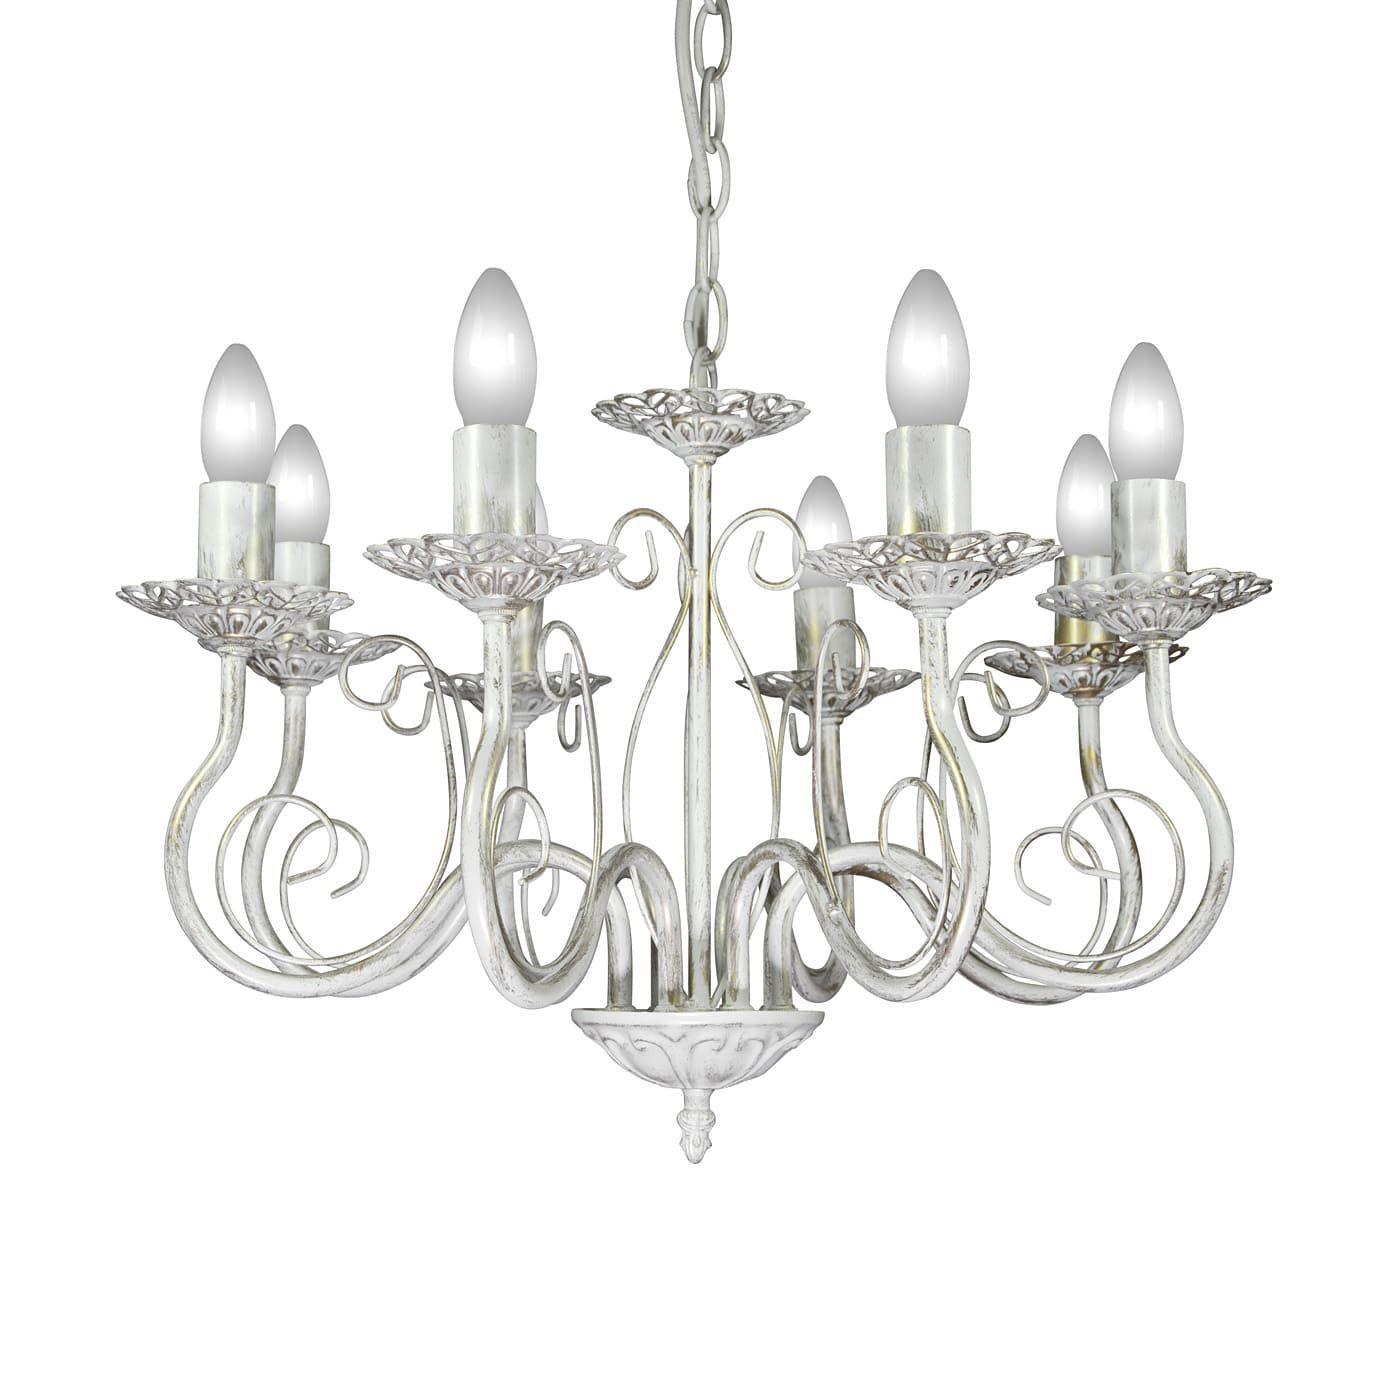 PETRASVET / Pendant chandelier S1161-8, 8xE14 max. 60W